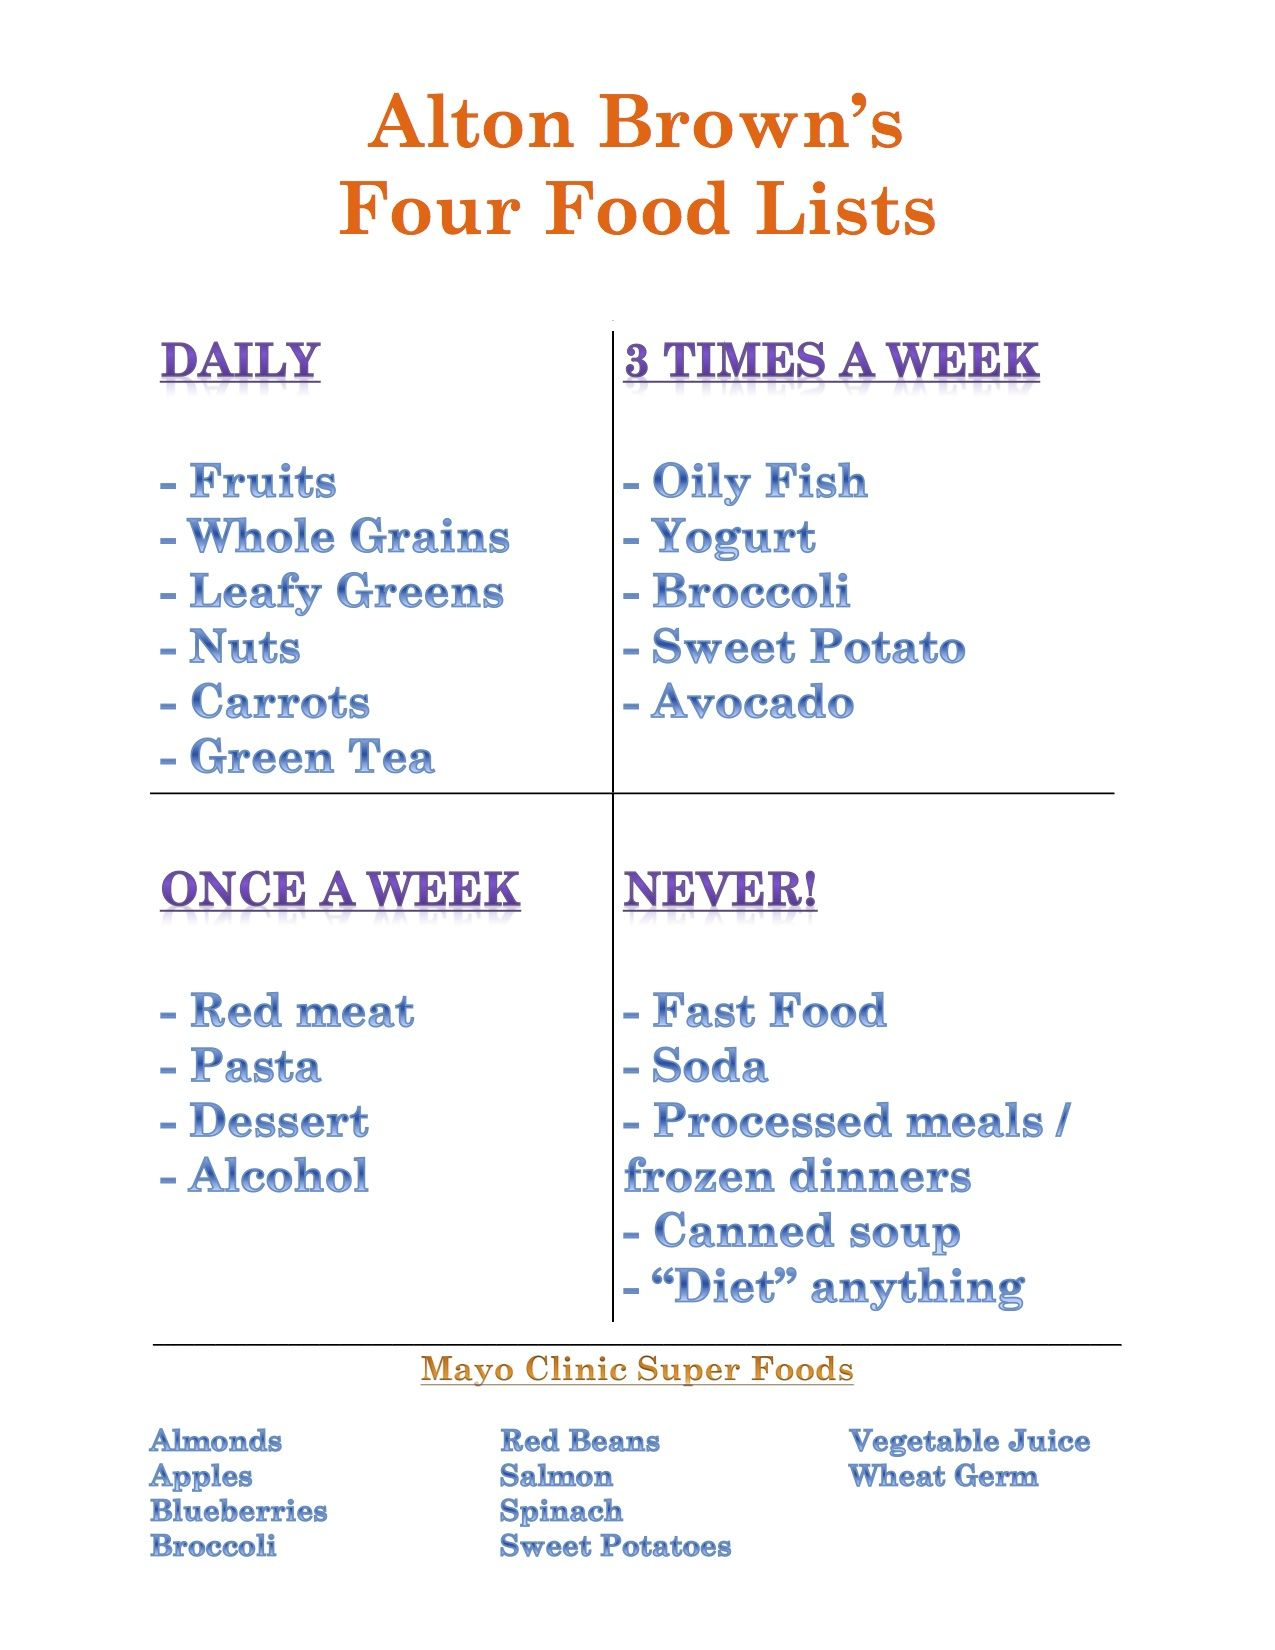 Food Expert Alton Browns Four List Diet Plan